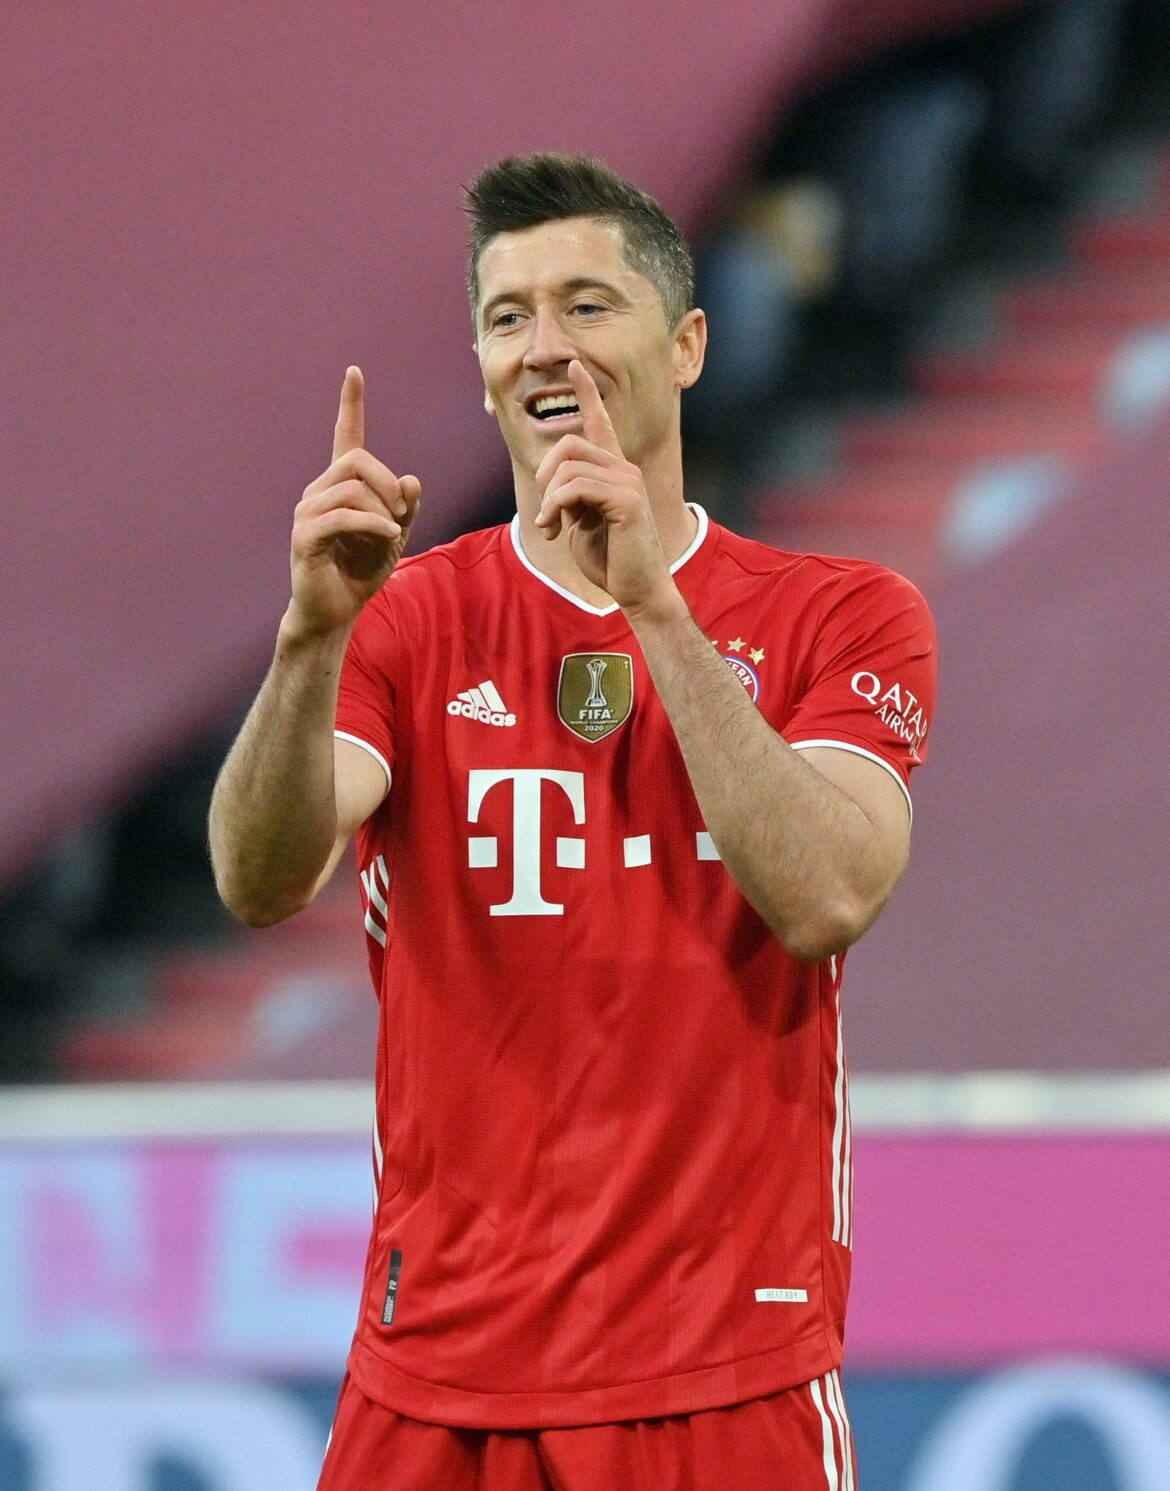 Umfrage unter den Profis:Lewandowski bester Feldspieler